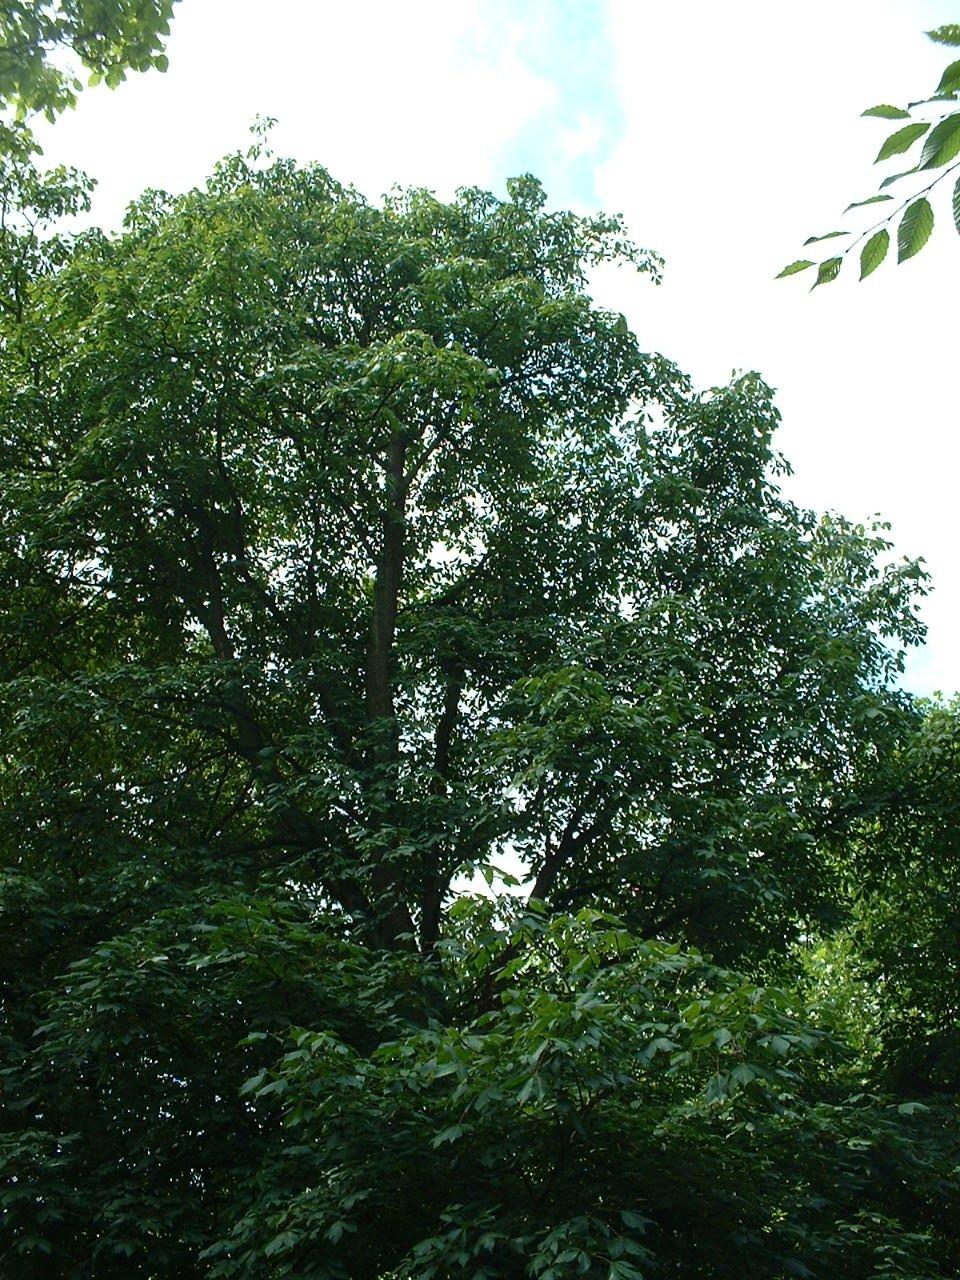 Marronnier pavier – Watermael-Boitsfort, Parc Tenreuken, Boulevard du Souverain –  19 Juillet 2002